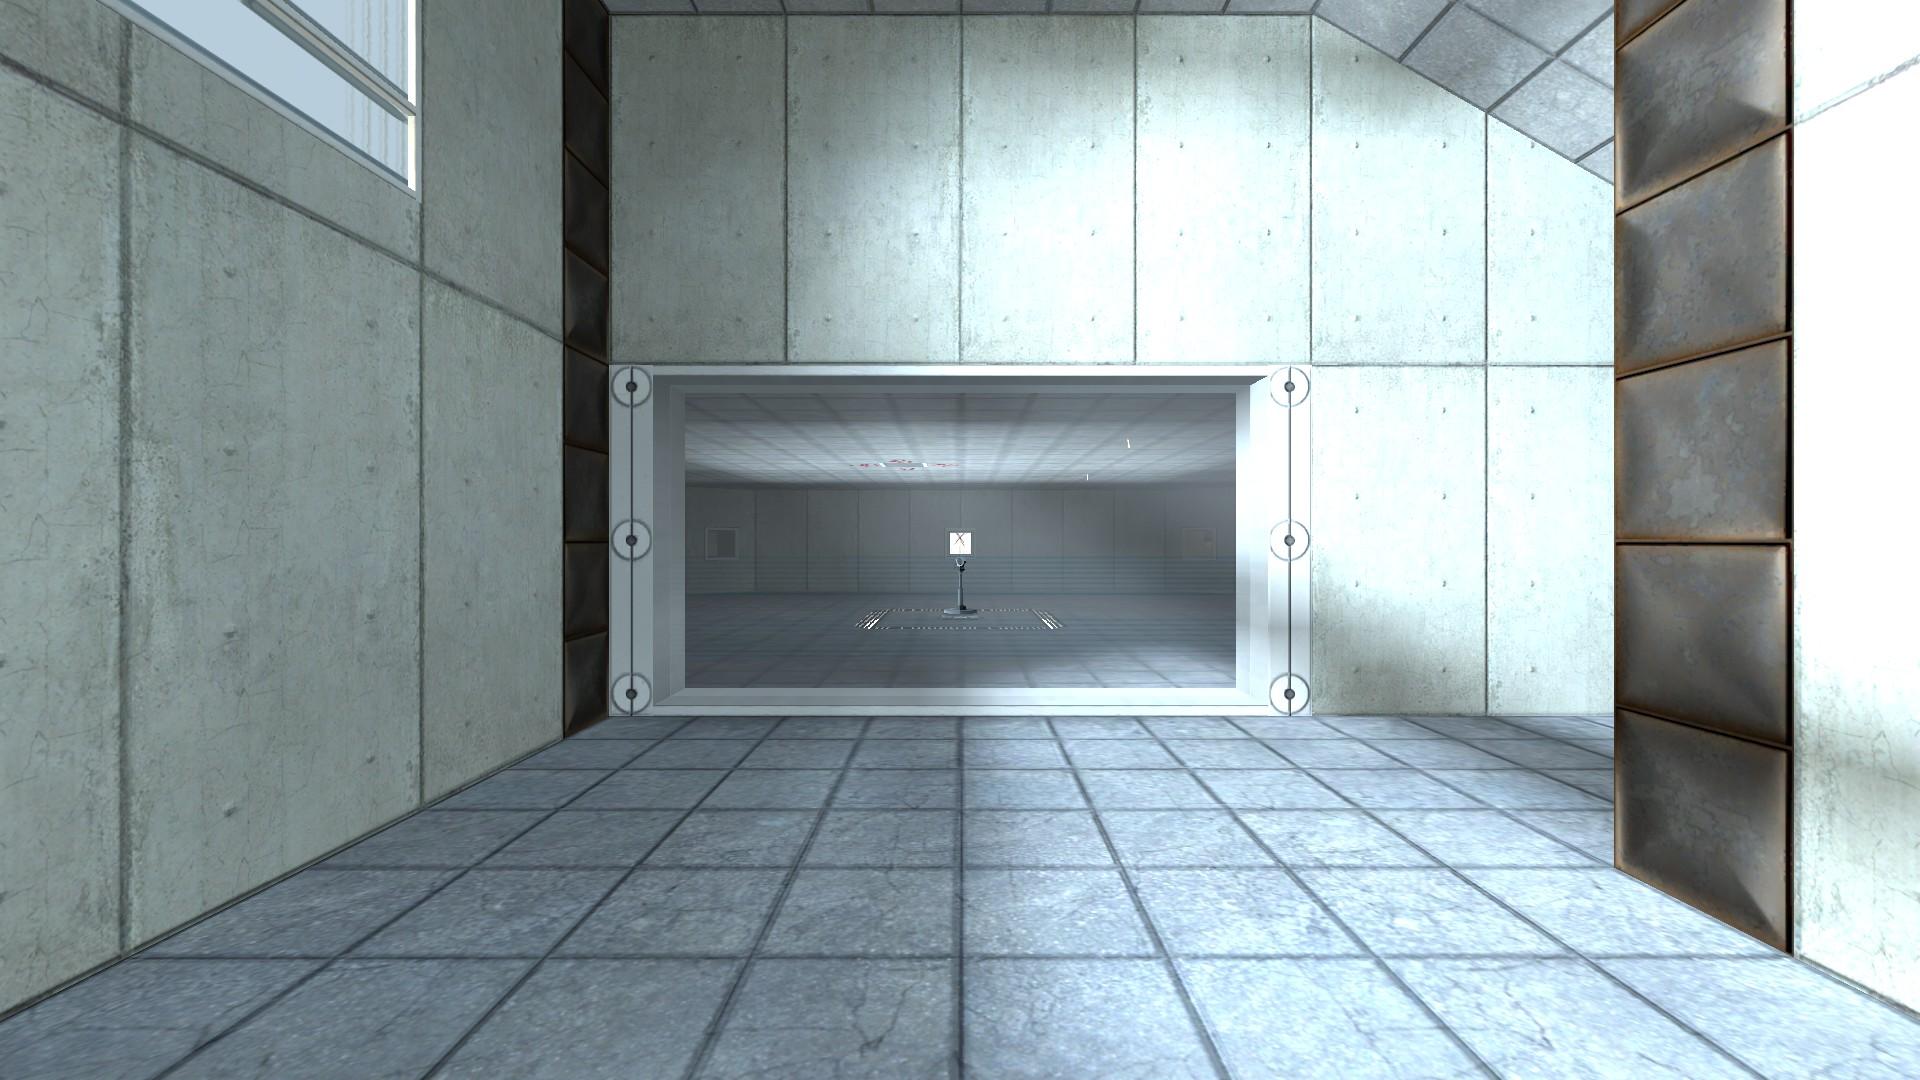 Entering chamber 2.